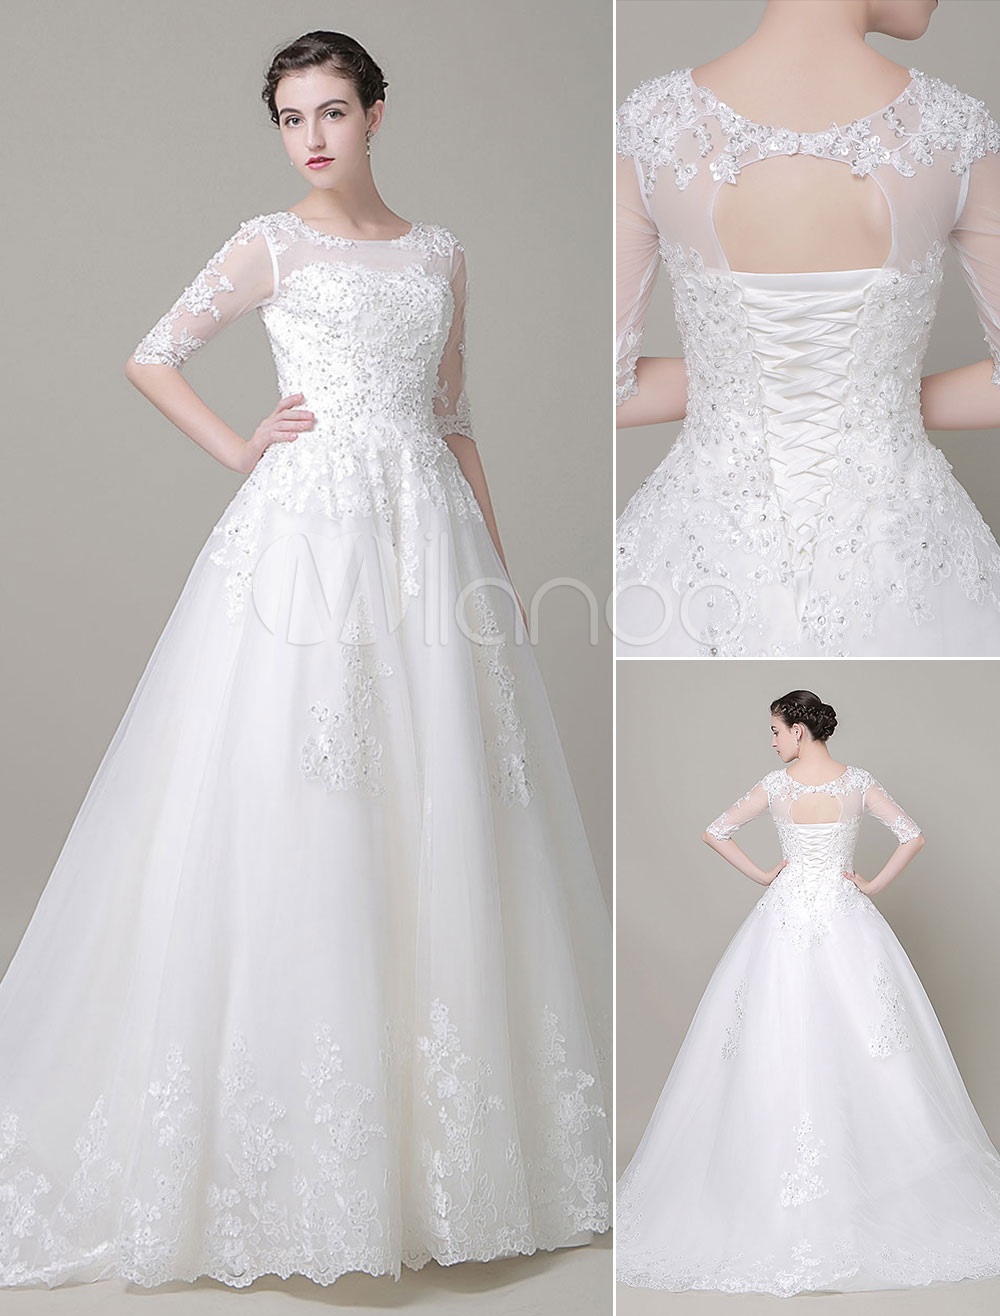 Milanoo / A-Line Wedding Dress Illusion Jewel Neckline Lace Beading Court Train Bridal Dress